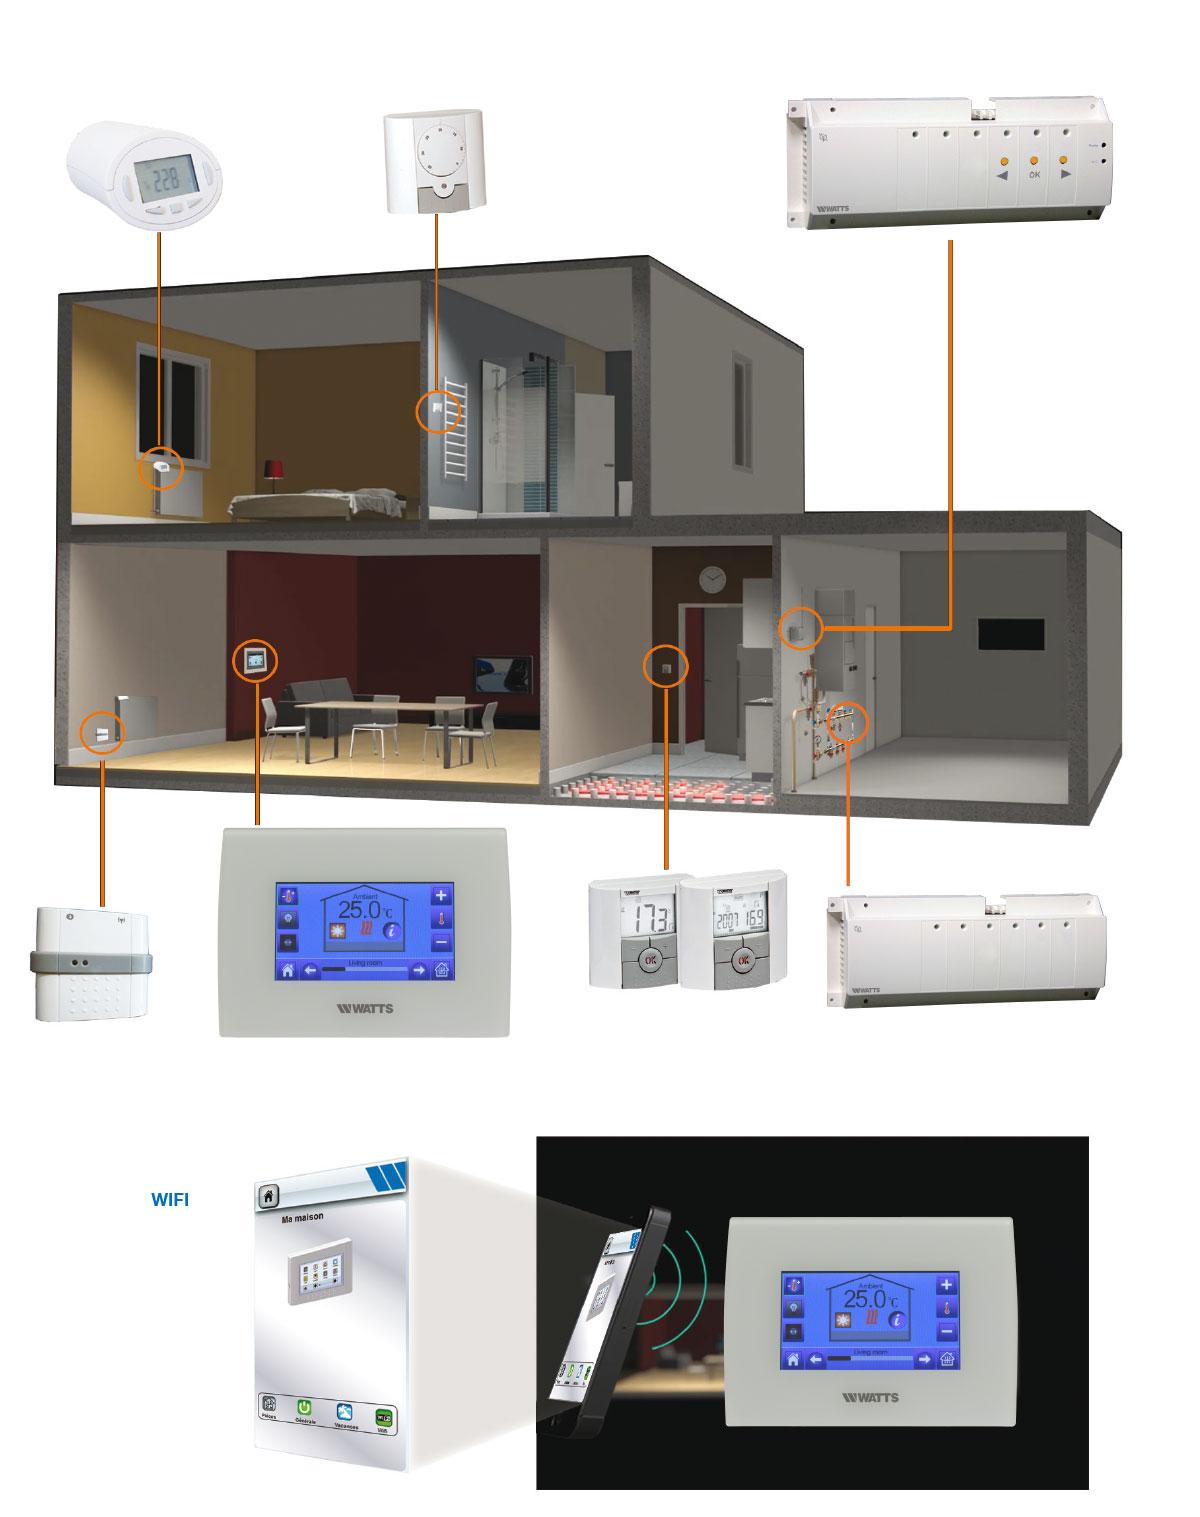 watts vision systeem 868 mhz watts waterbeveiliging. Black Bedroom Furniture Sets. Home Design Ideas